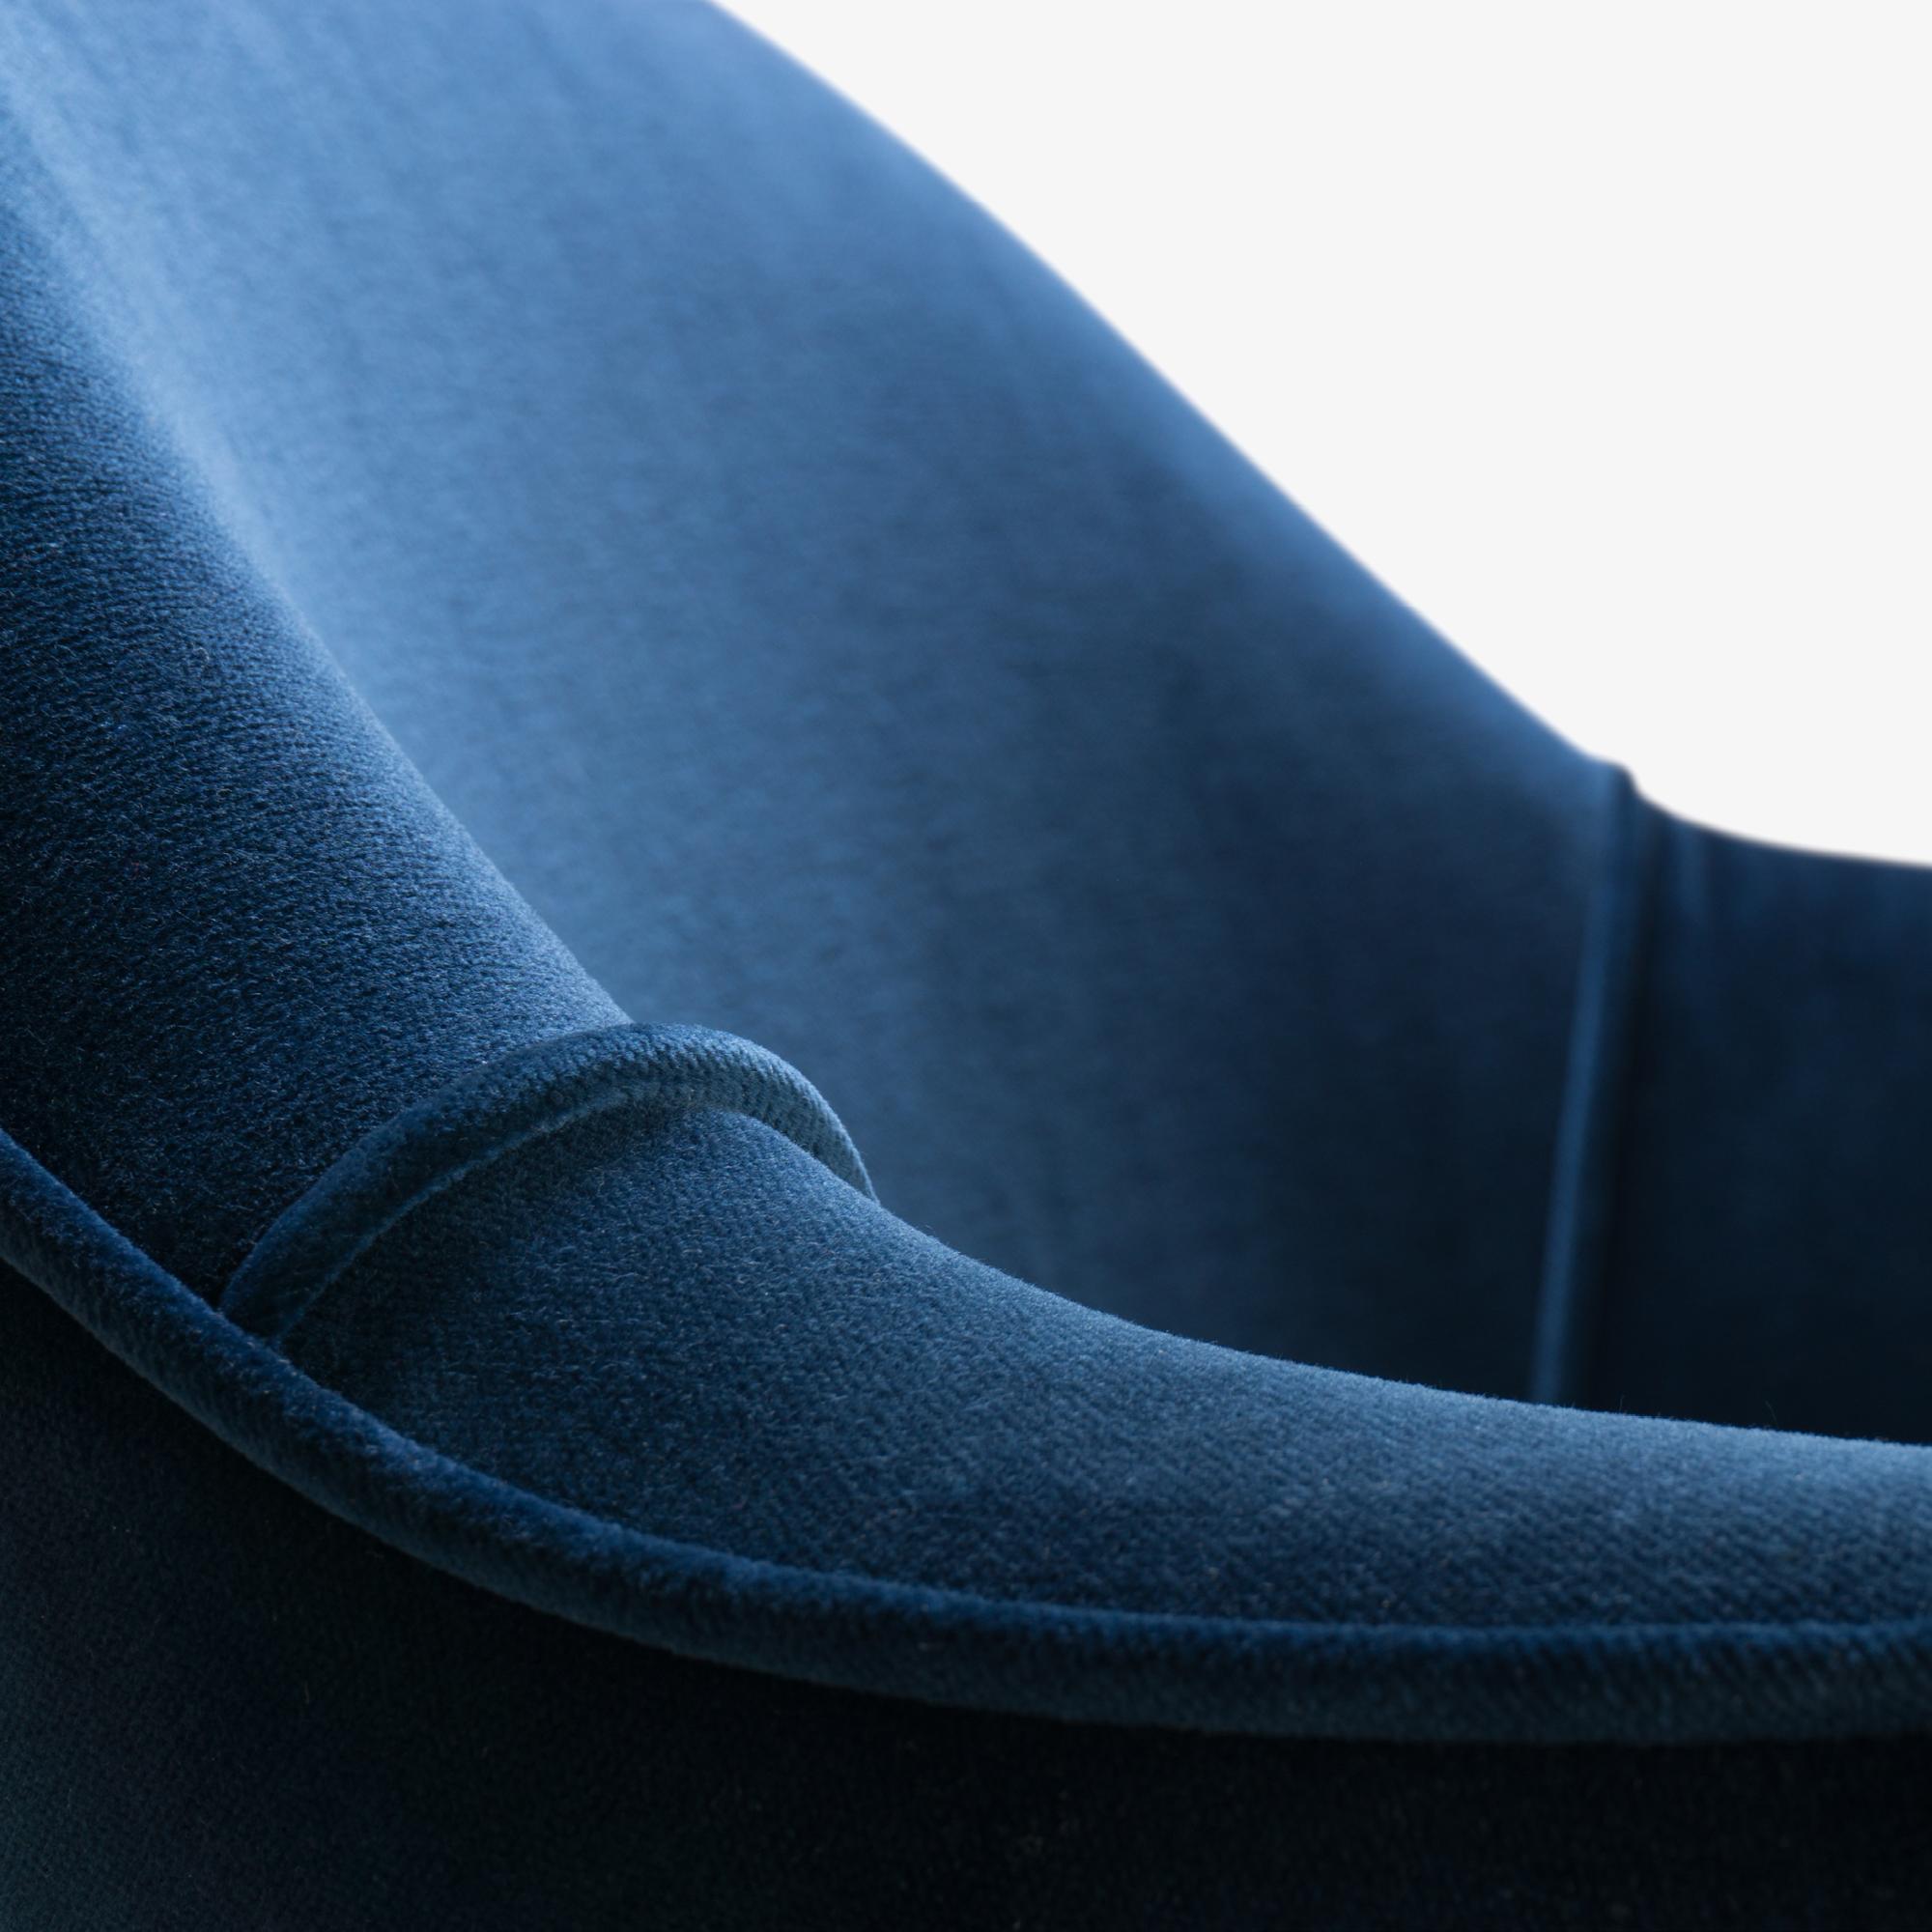 Saarinen Executive Arm Chair in Navy Velvet, Swivel Base, 24k Gold Edition8.png